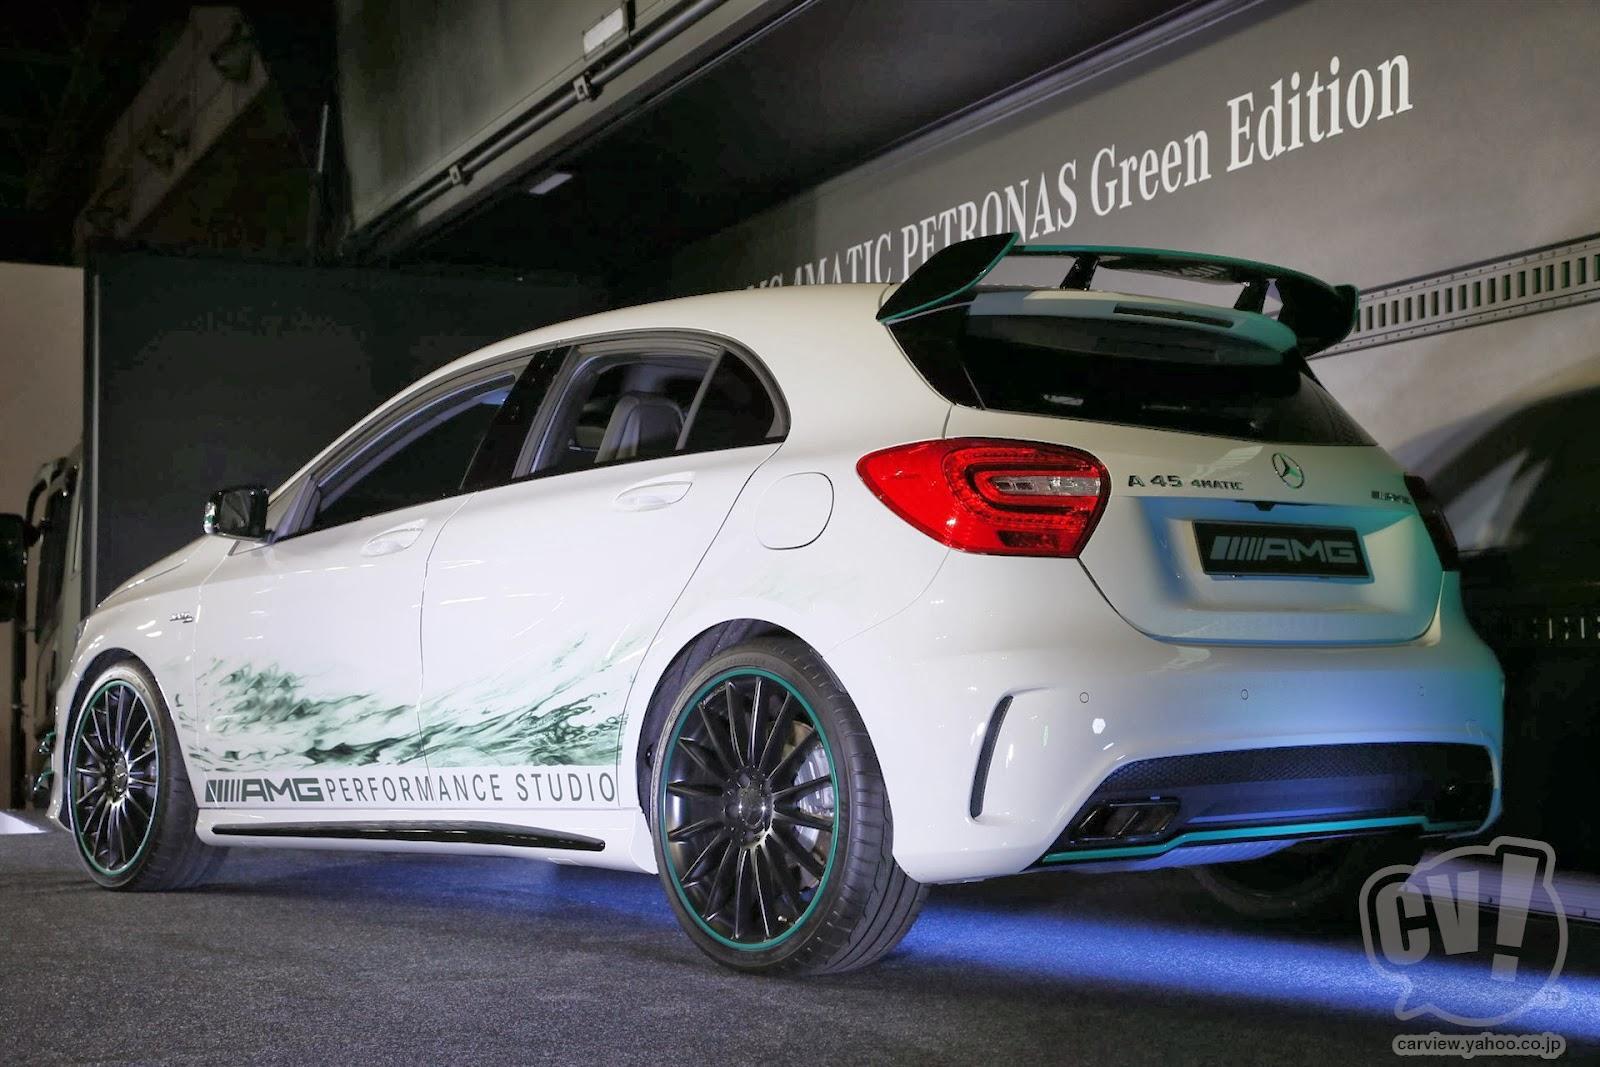 Mercedes benz a 45 amg petronas green edition is unique